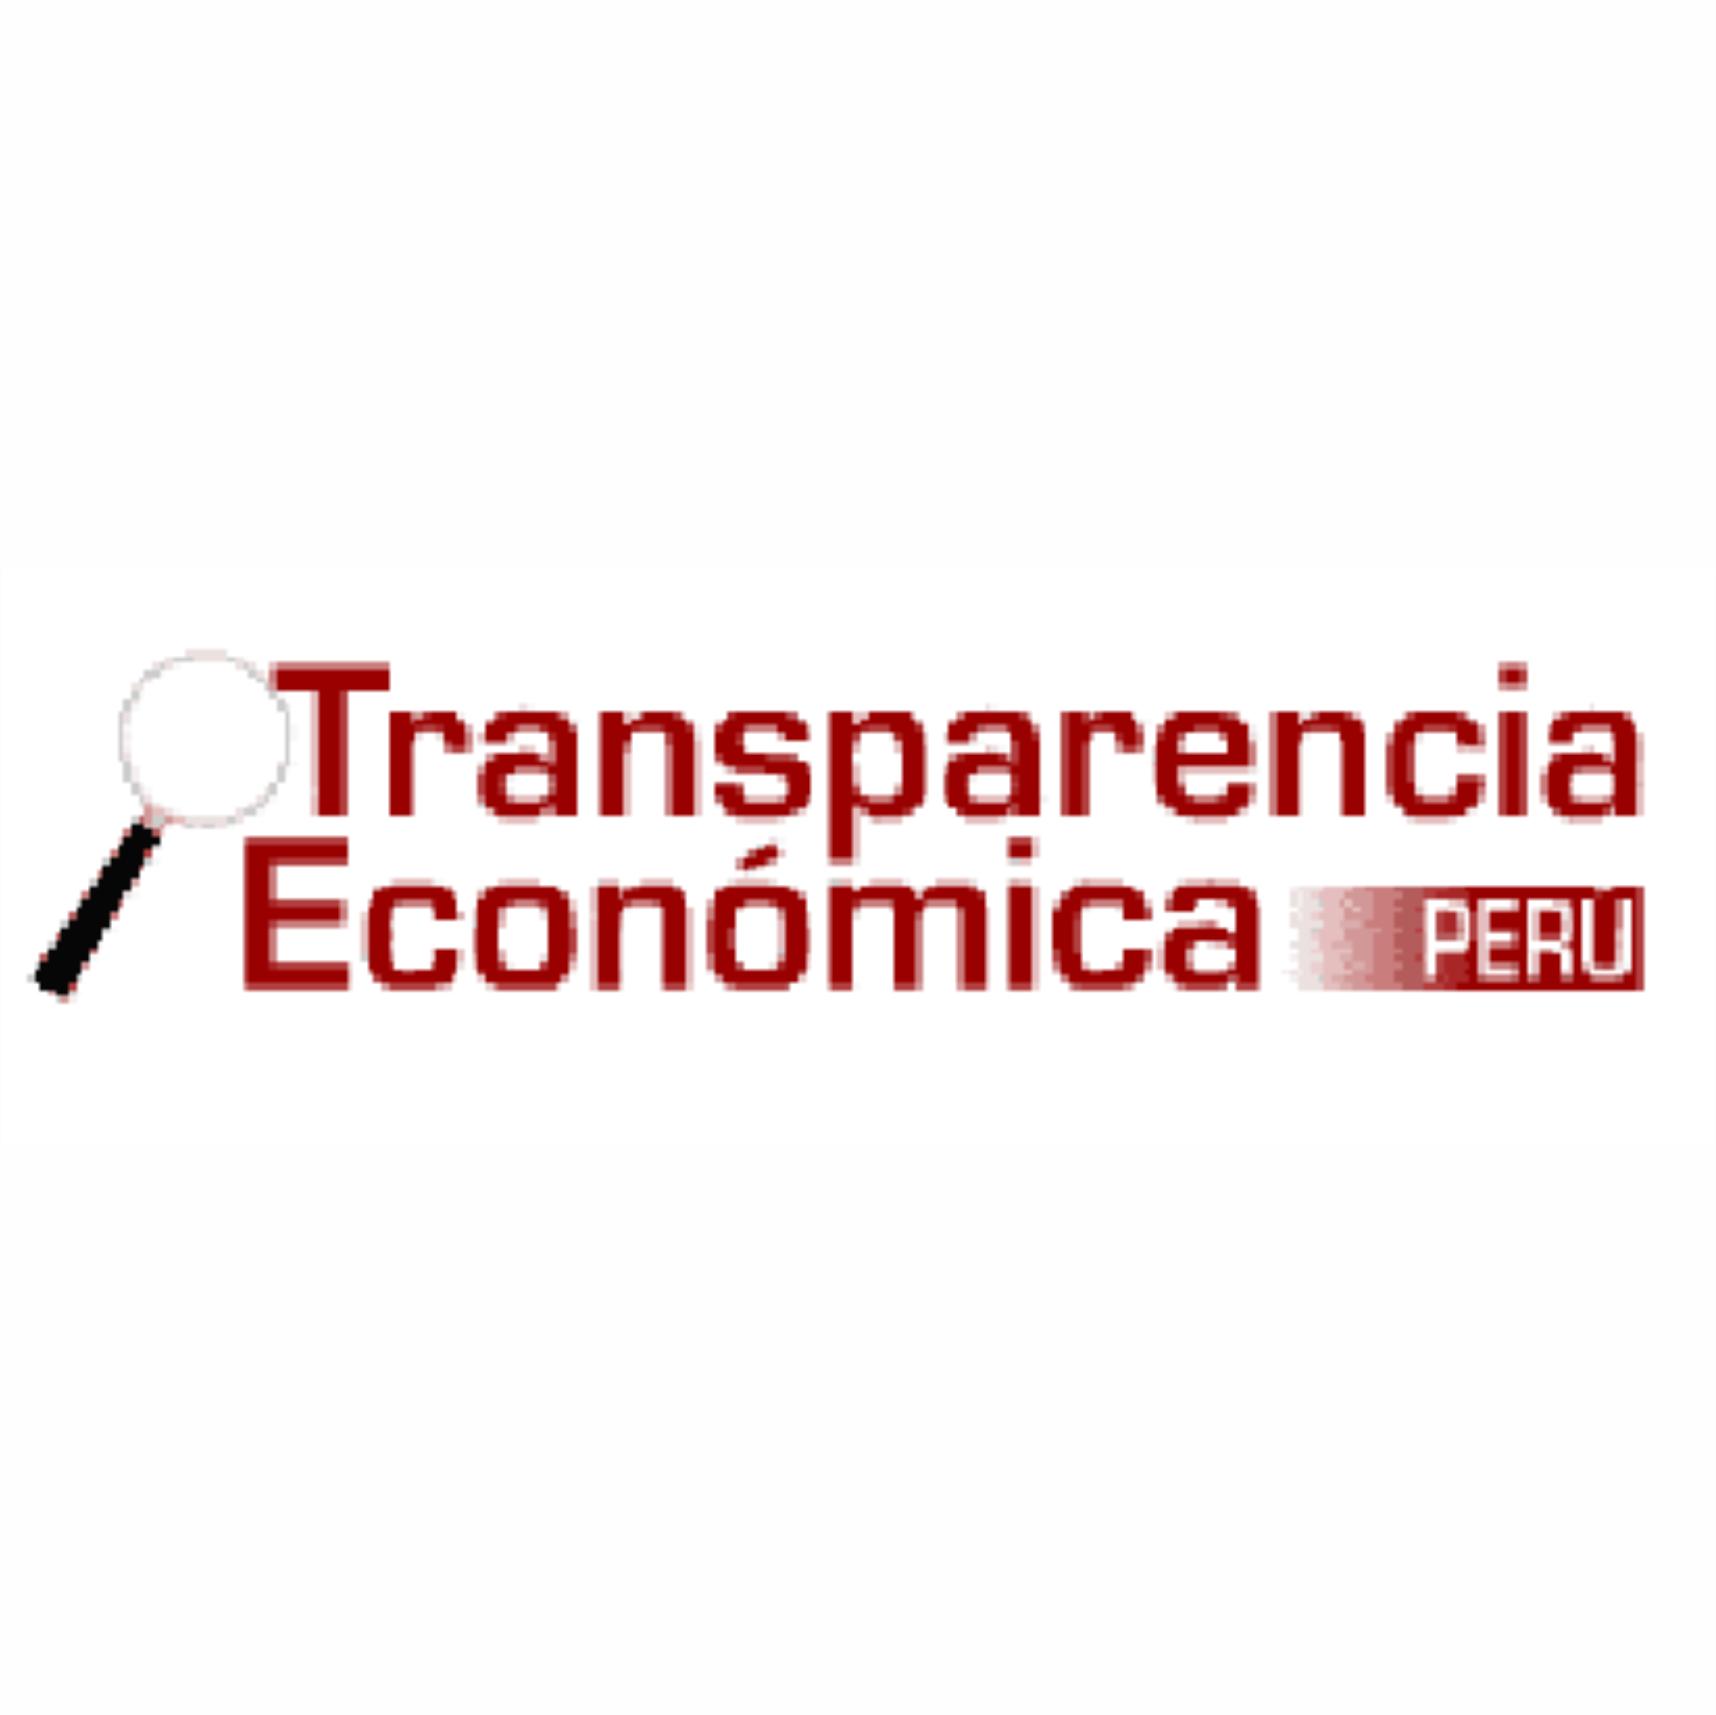 TRANSPARENCIA ECONOMICA